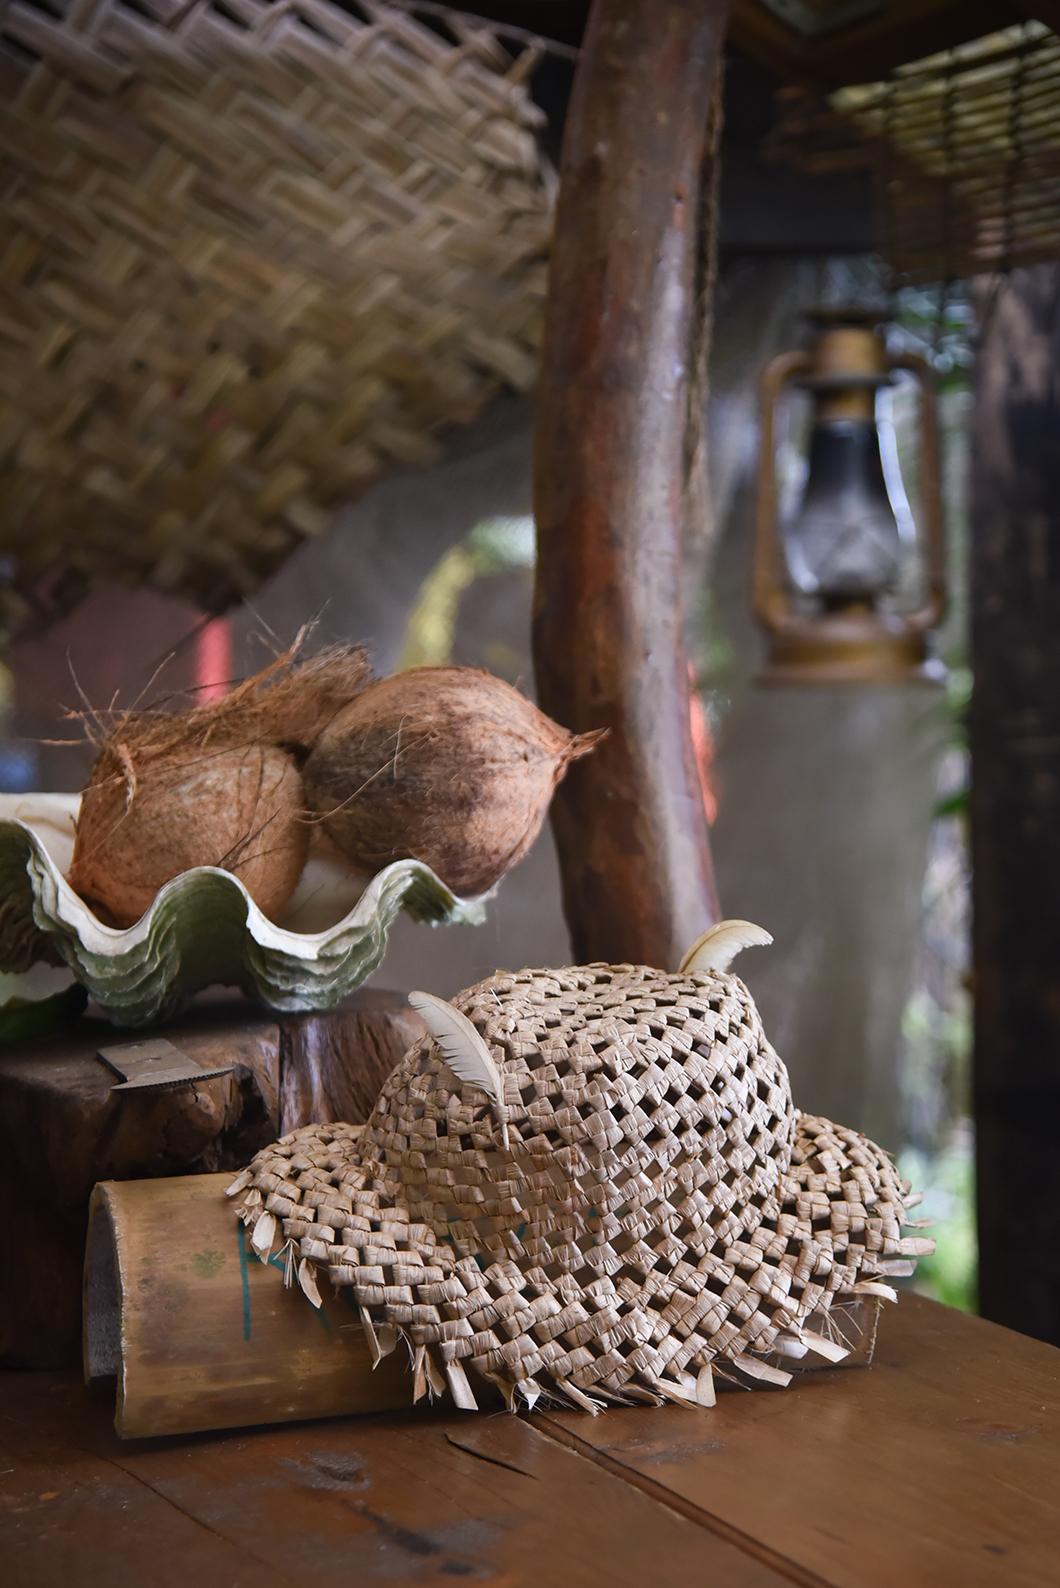 Manger dans une roulotte à Tahiti, au Ô tumu mape